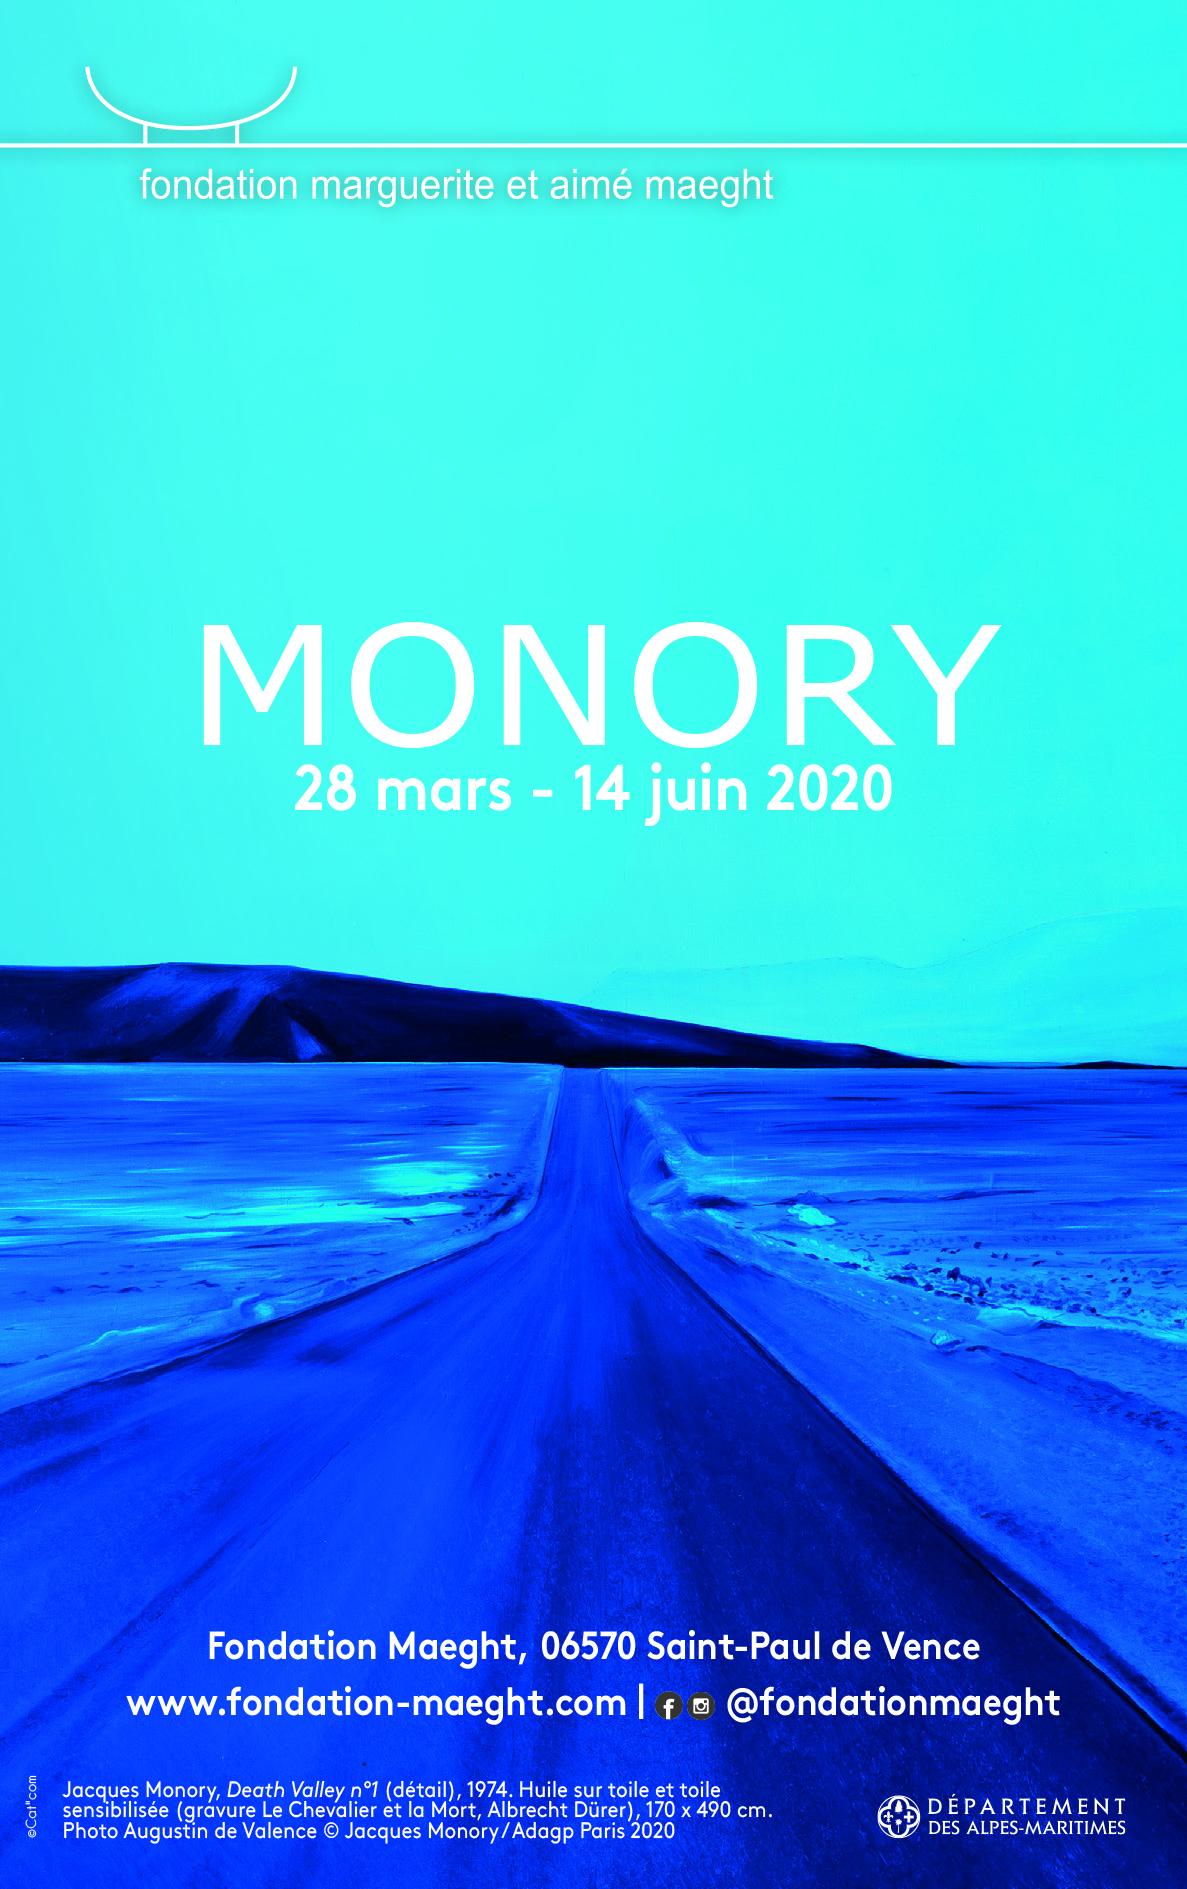 Jacques Monory, Fondation Maeght DEL'ART#56